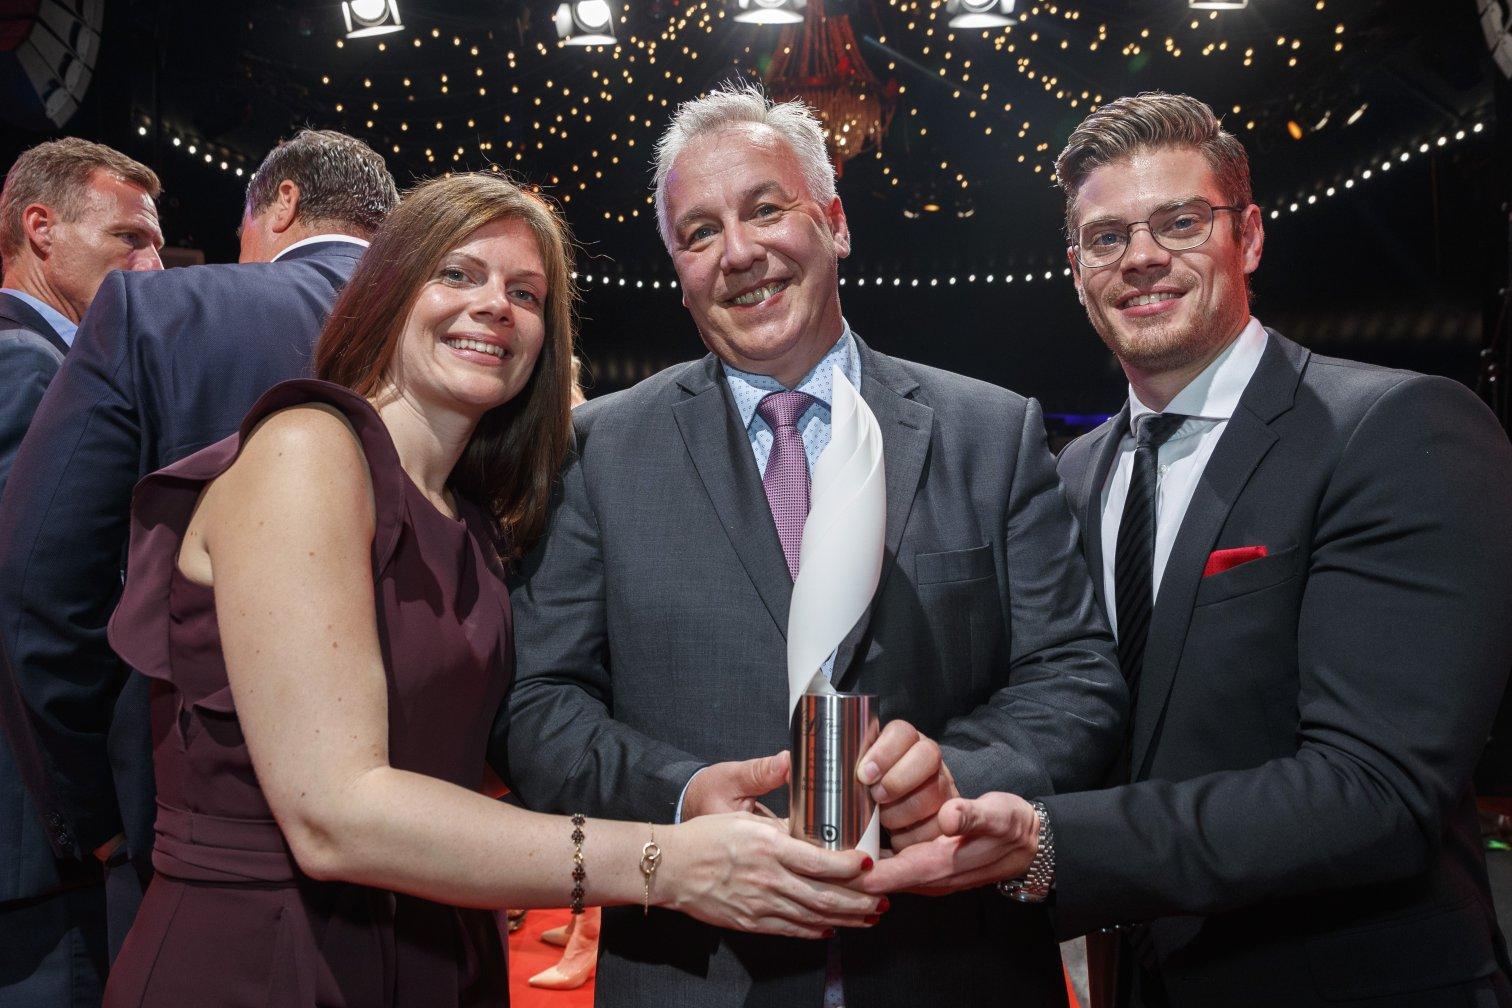 Gala 2018: Fuchsberger-Preis